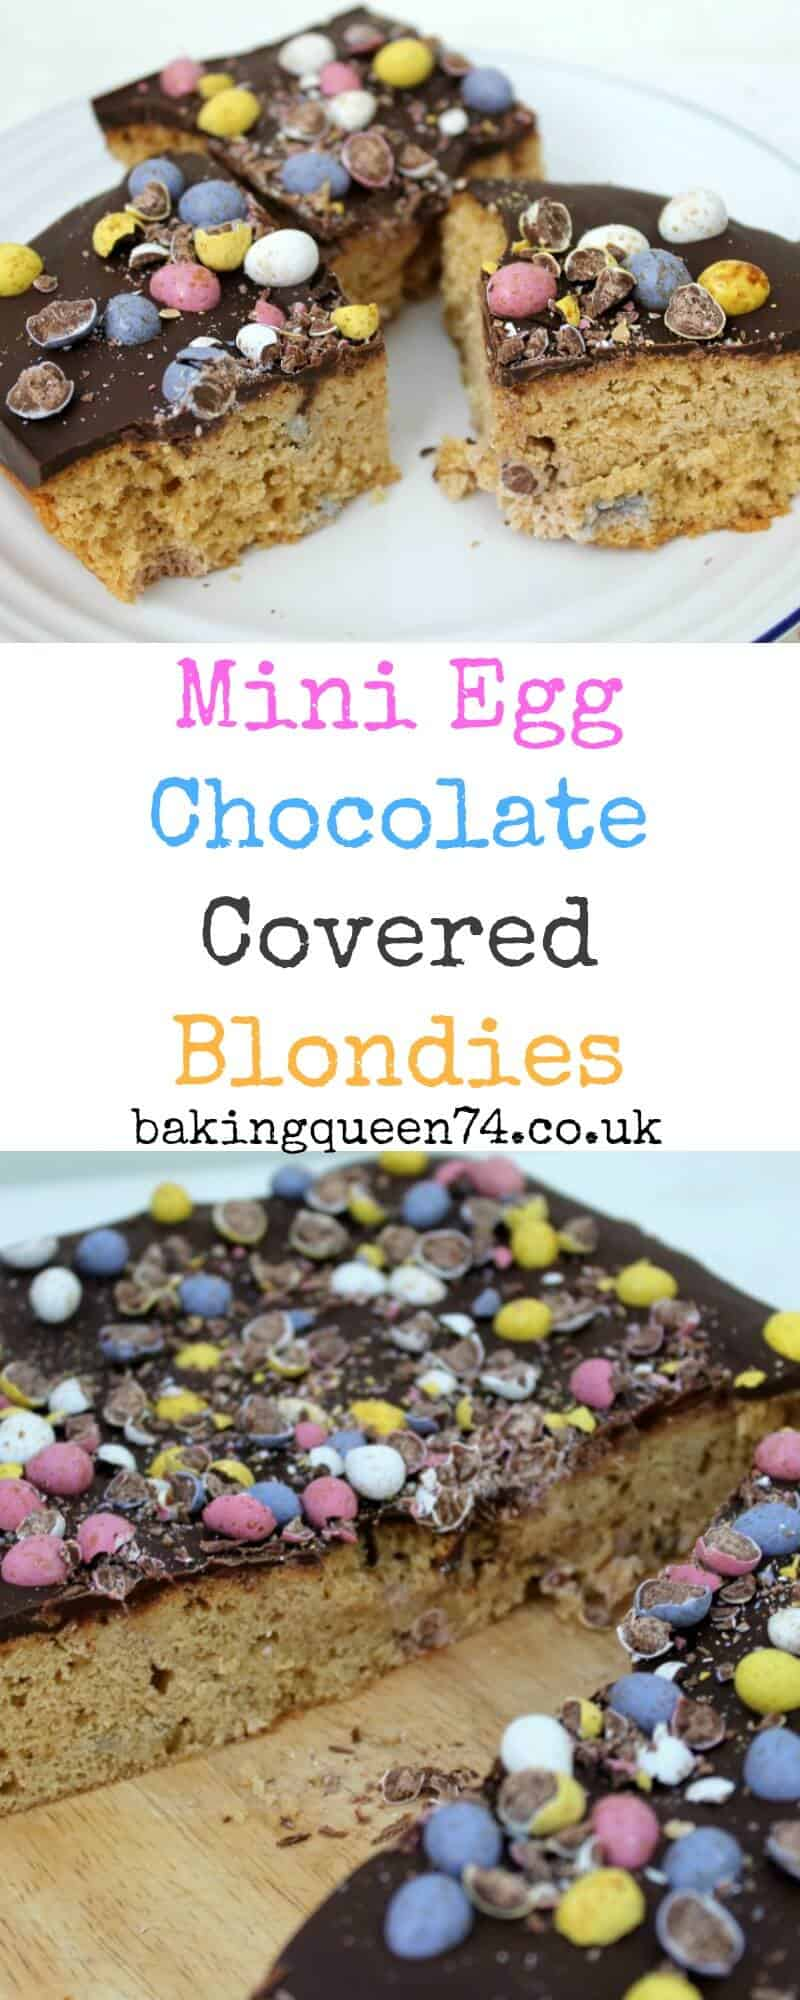 Mini Egg Chocolate Covered Blondies Bakingqueen74